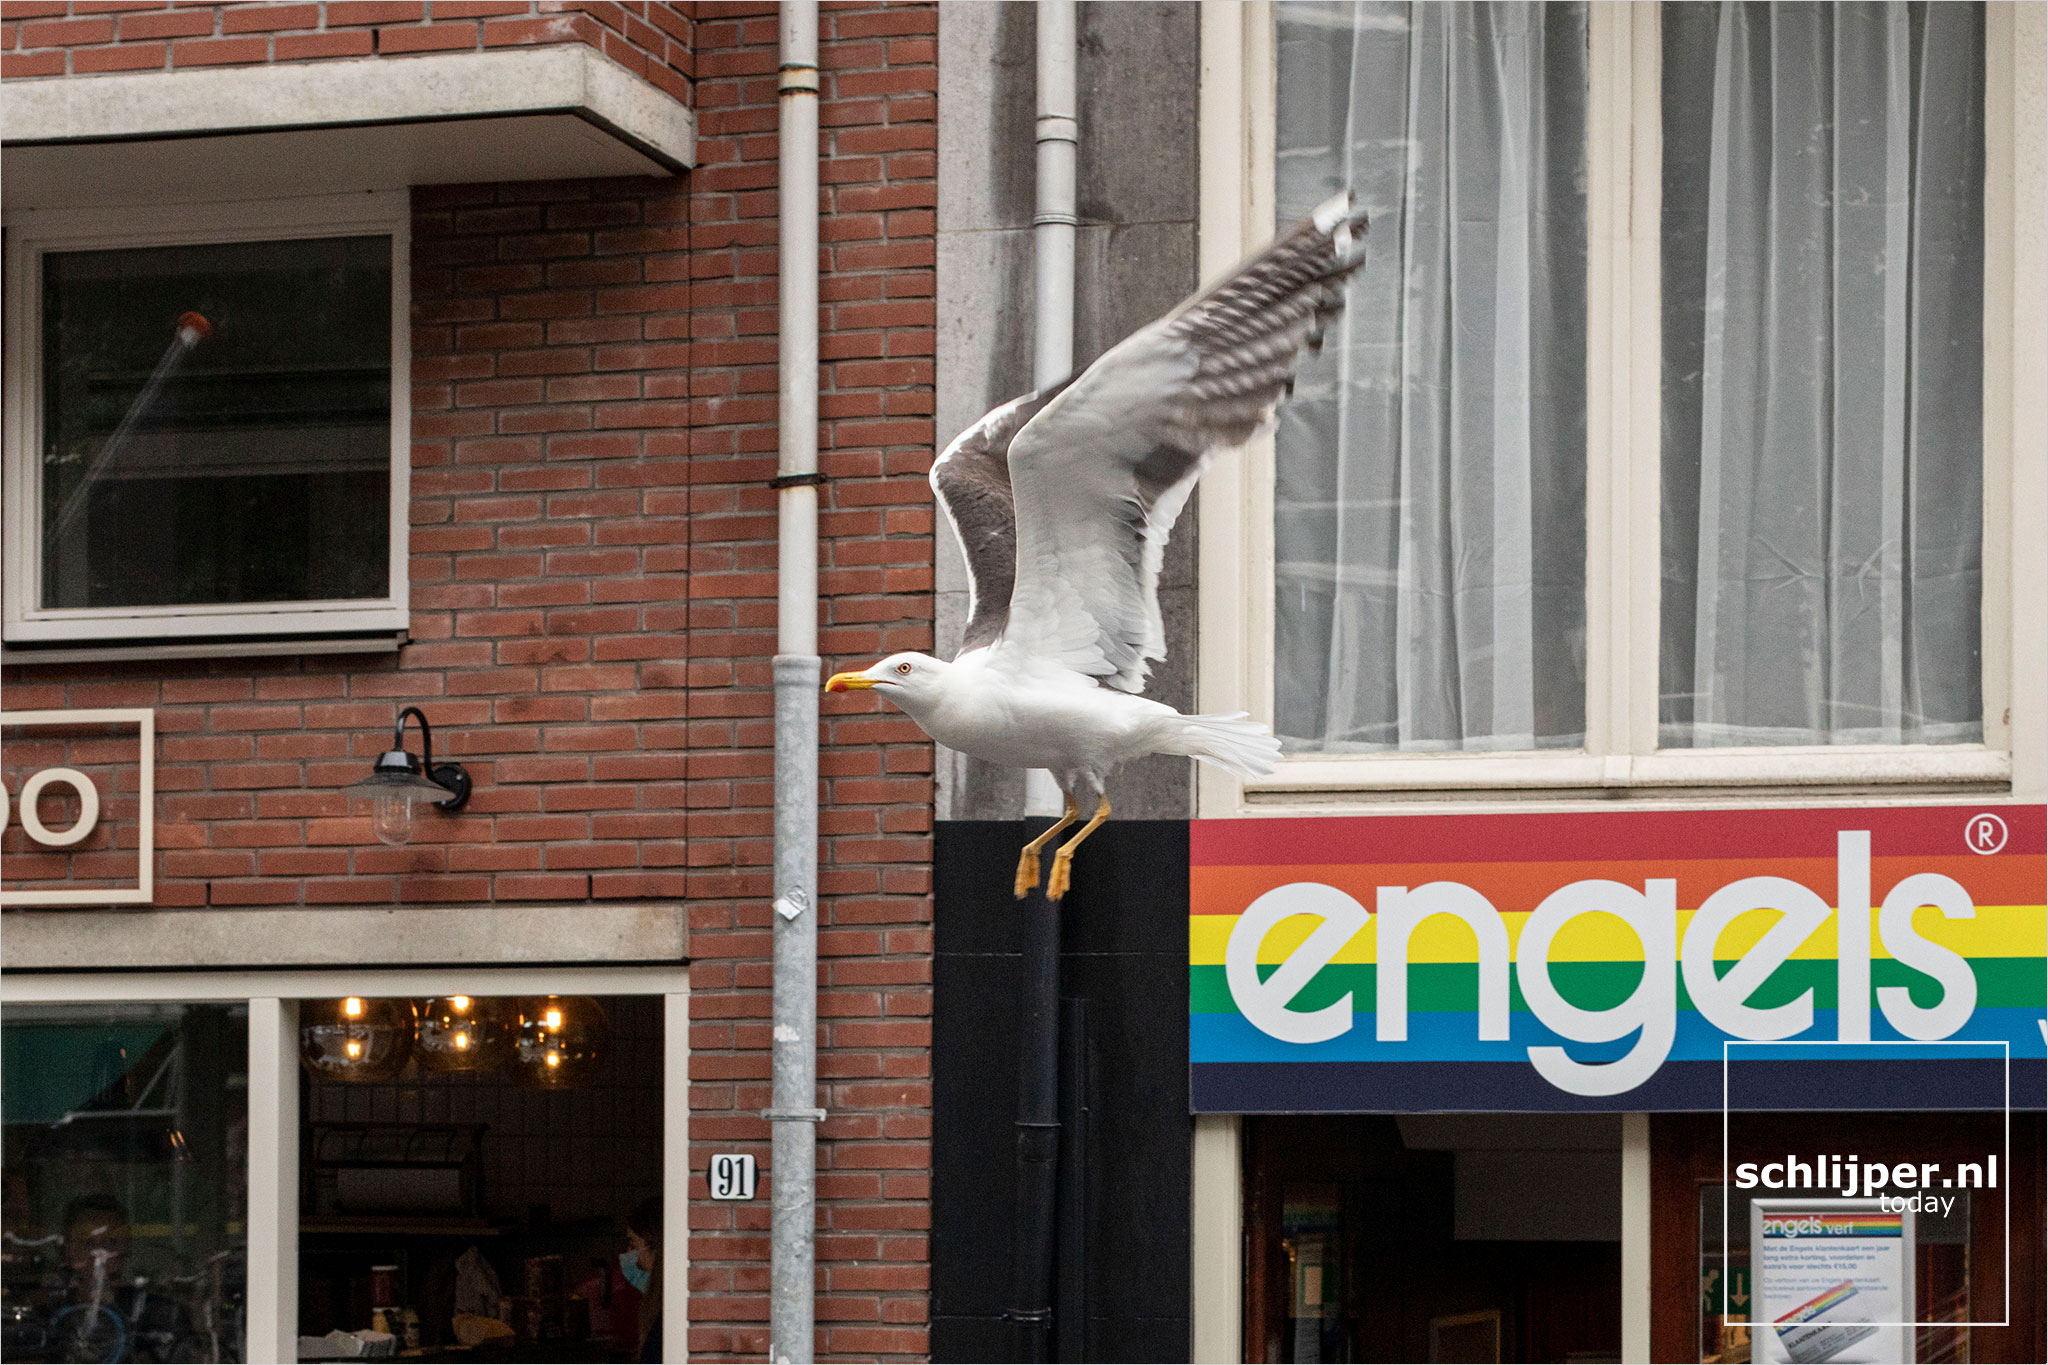 The Netherlands, Amsterdam, 28 juli 2021